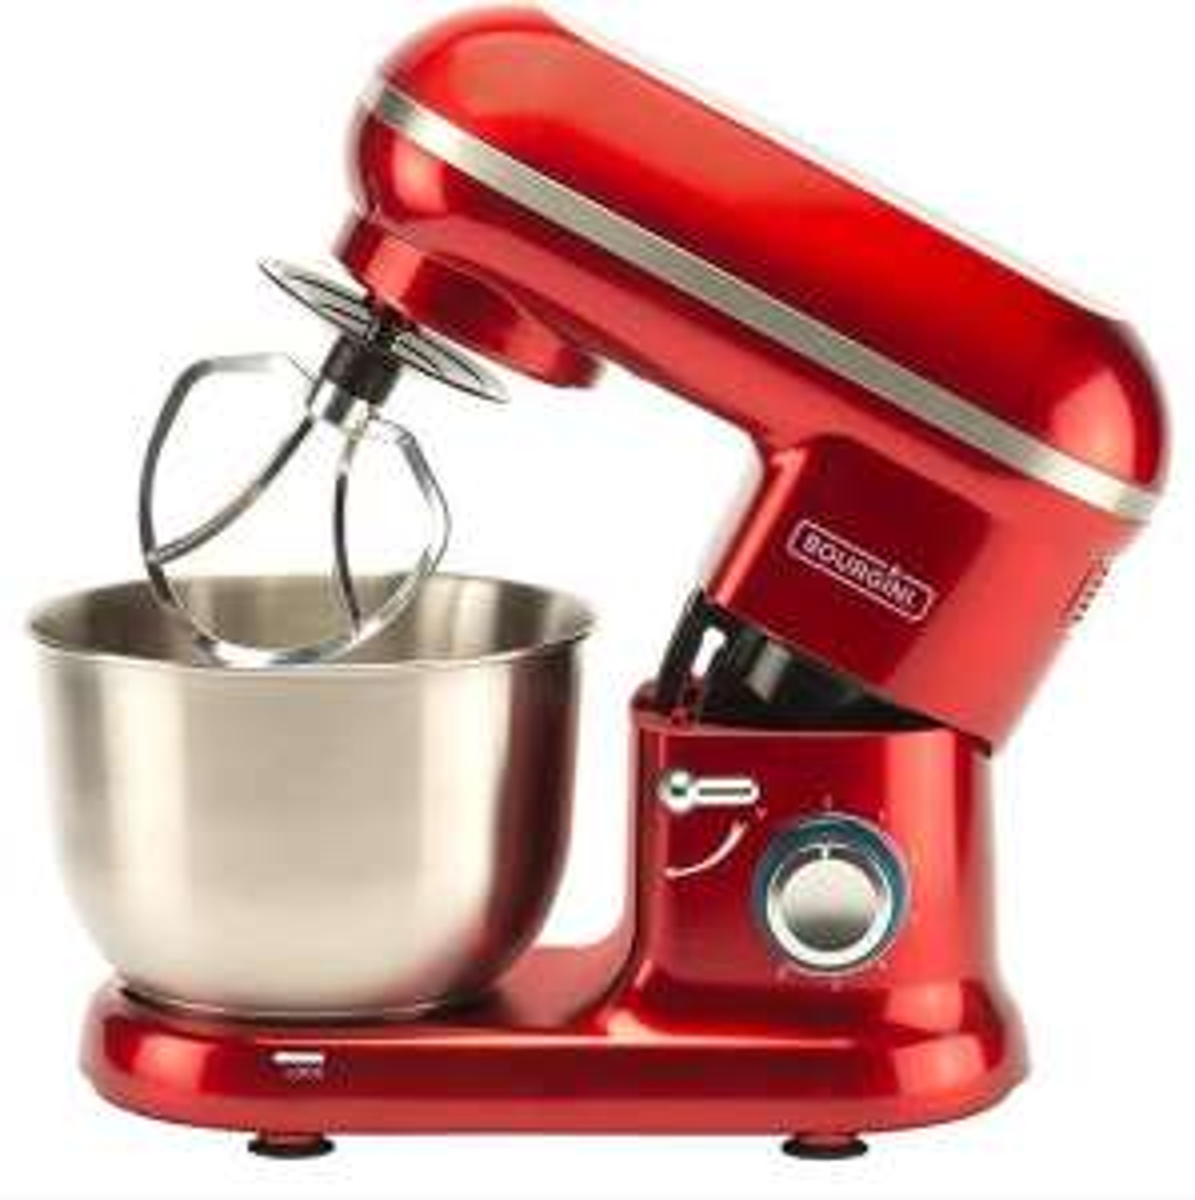 Bourgini keukenmachine